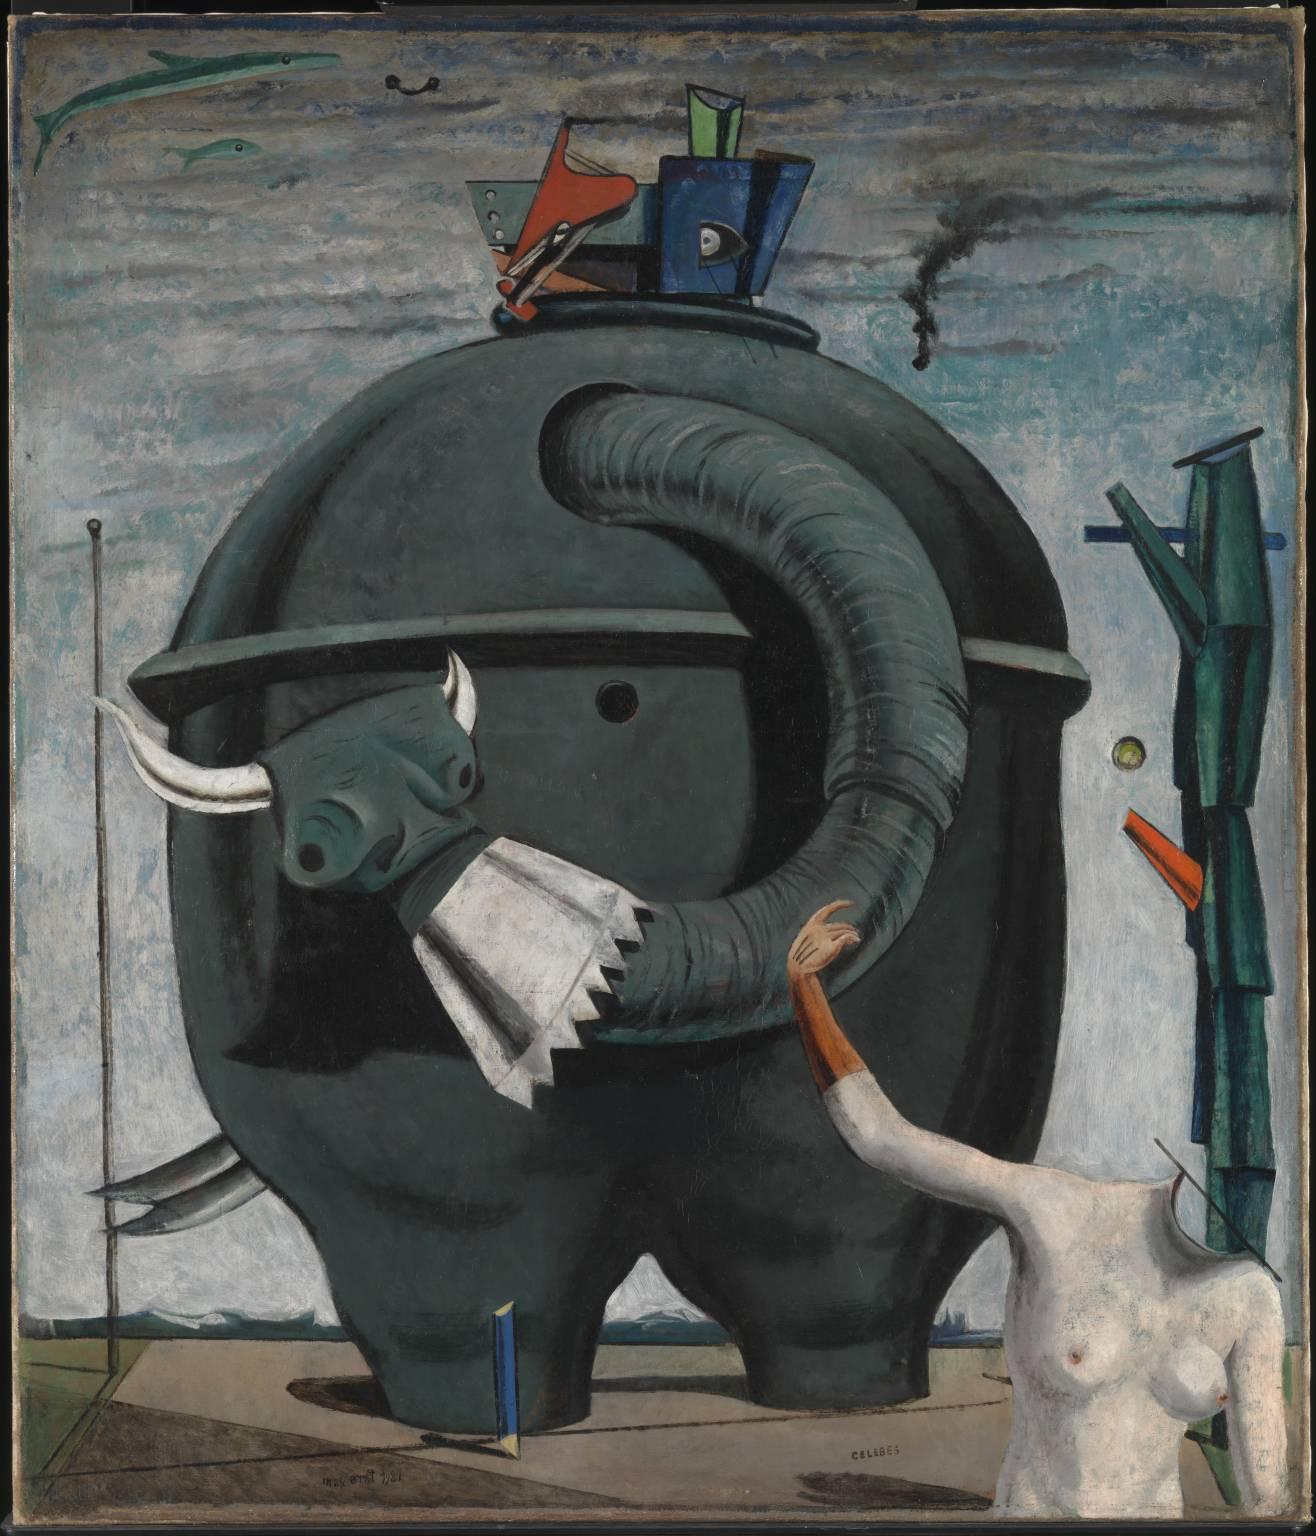 Celebes 1921 by Max Ernst 1891-1976